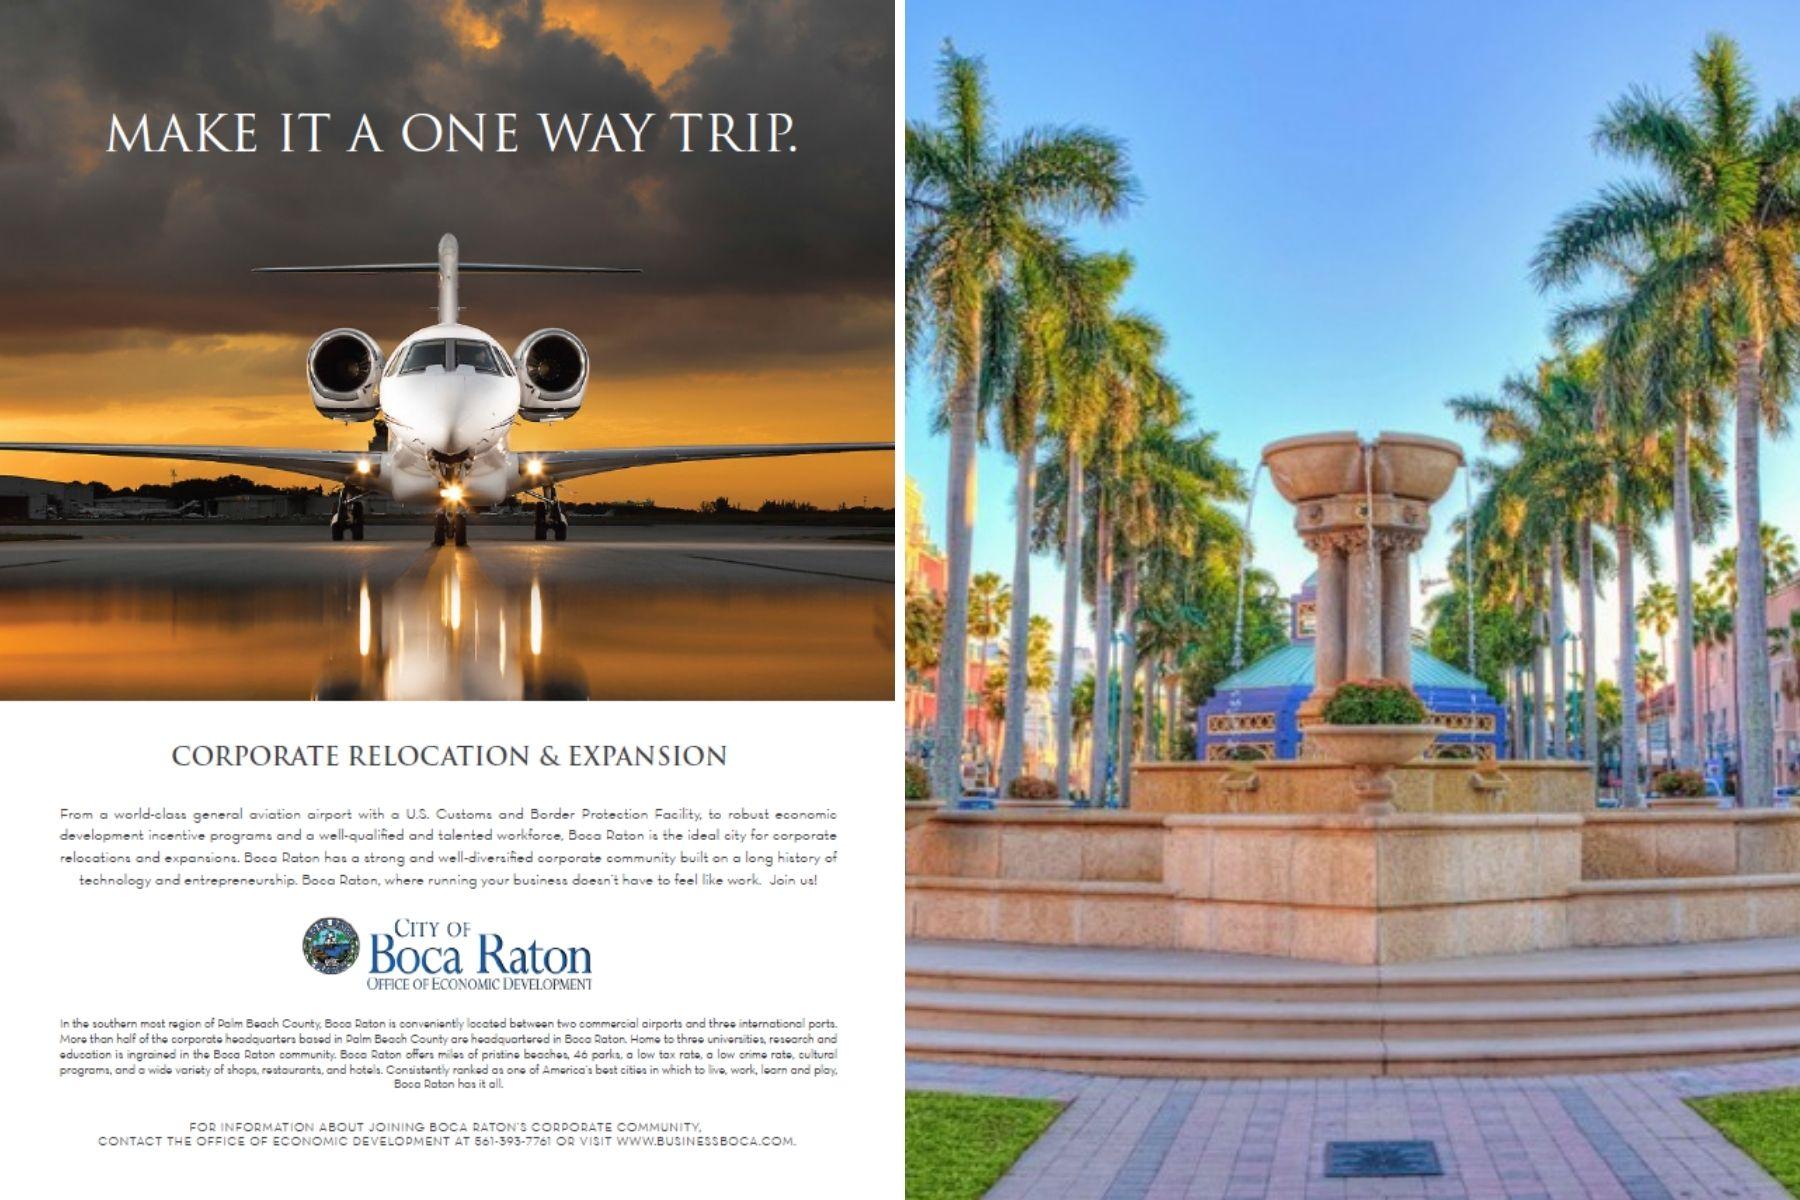 Privaira partnership with the City of Boca Raton